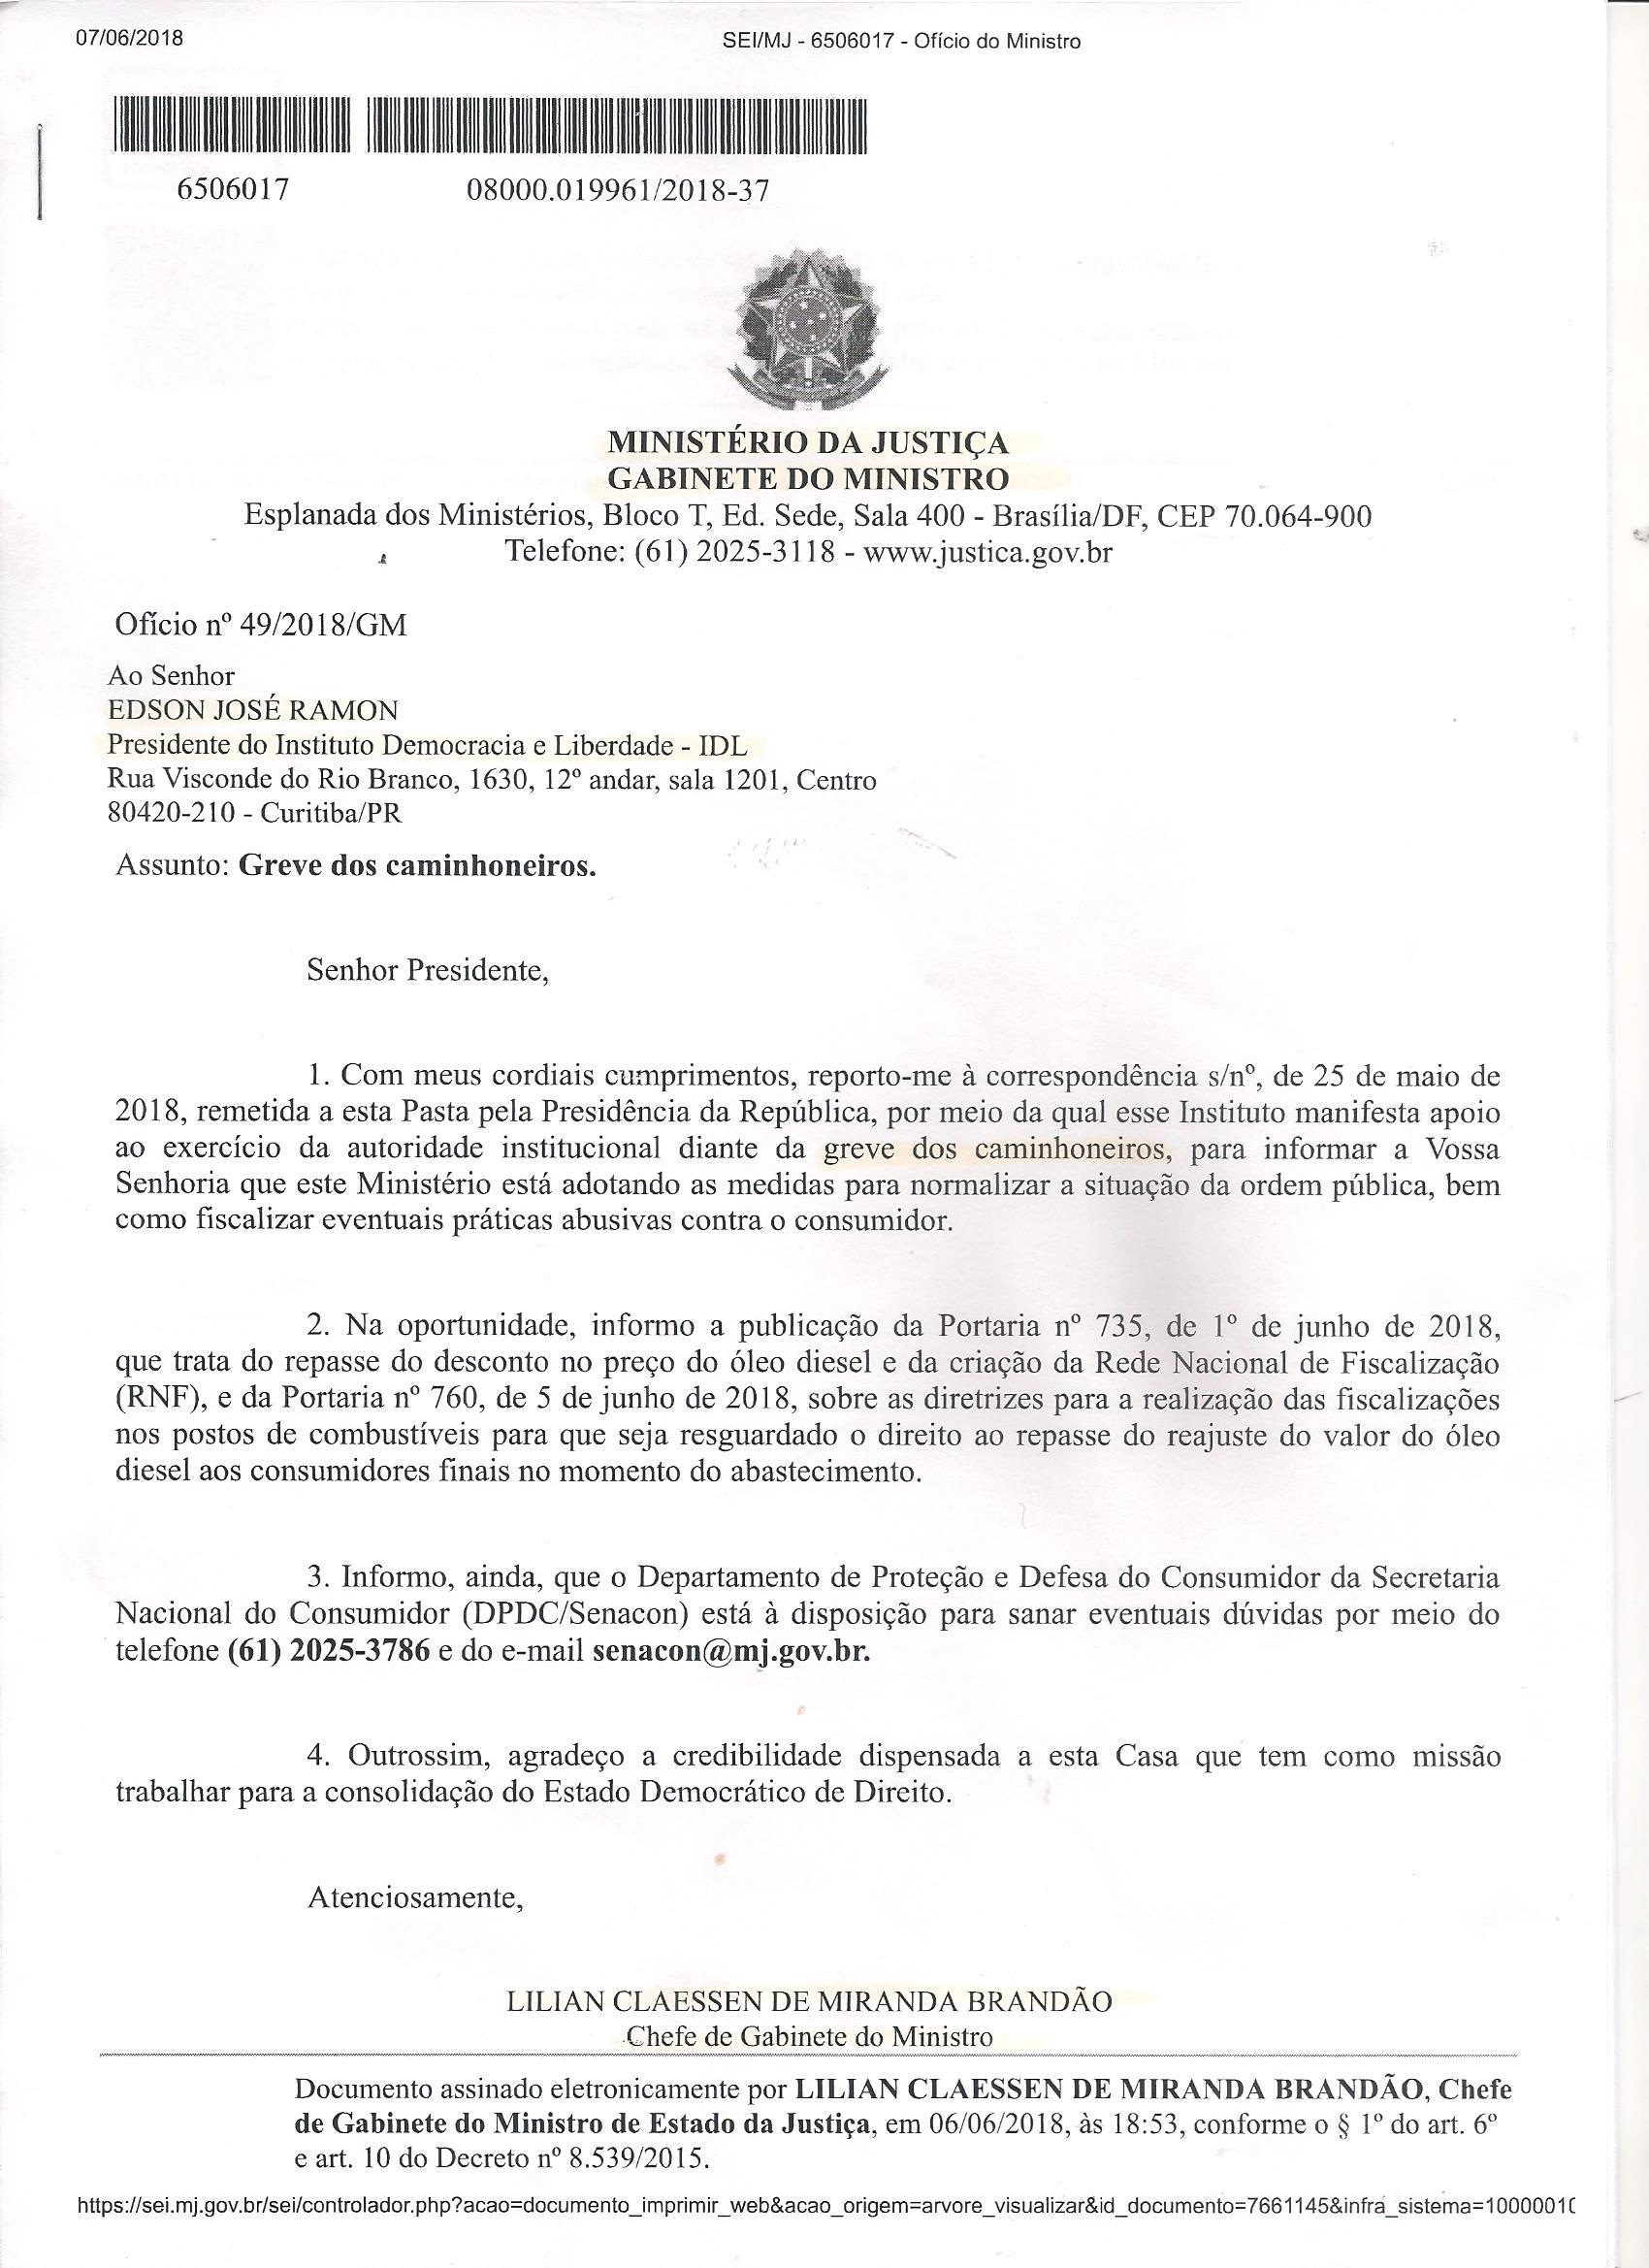 CARTA RESPOSTA RECEBIDA